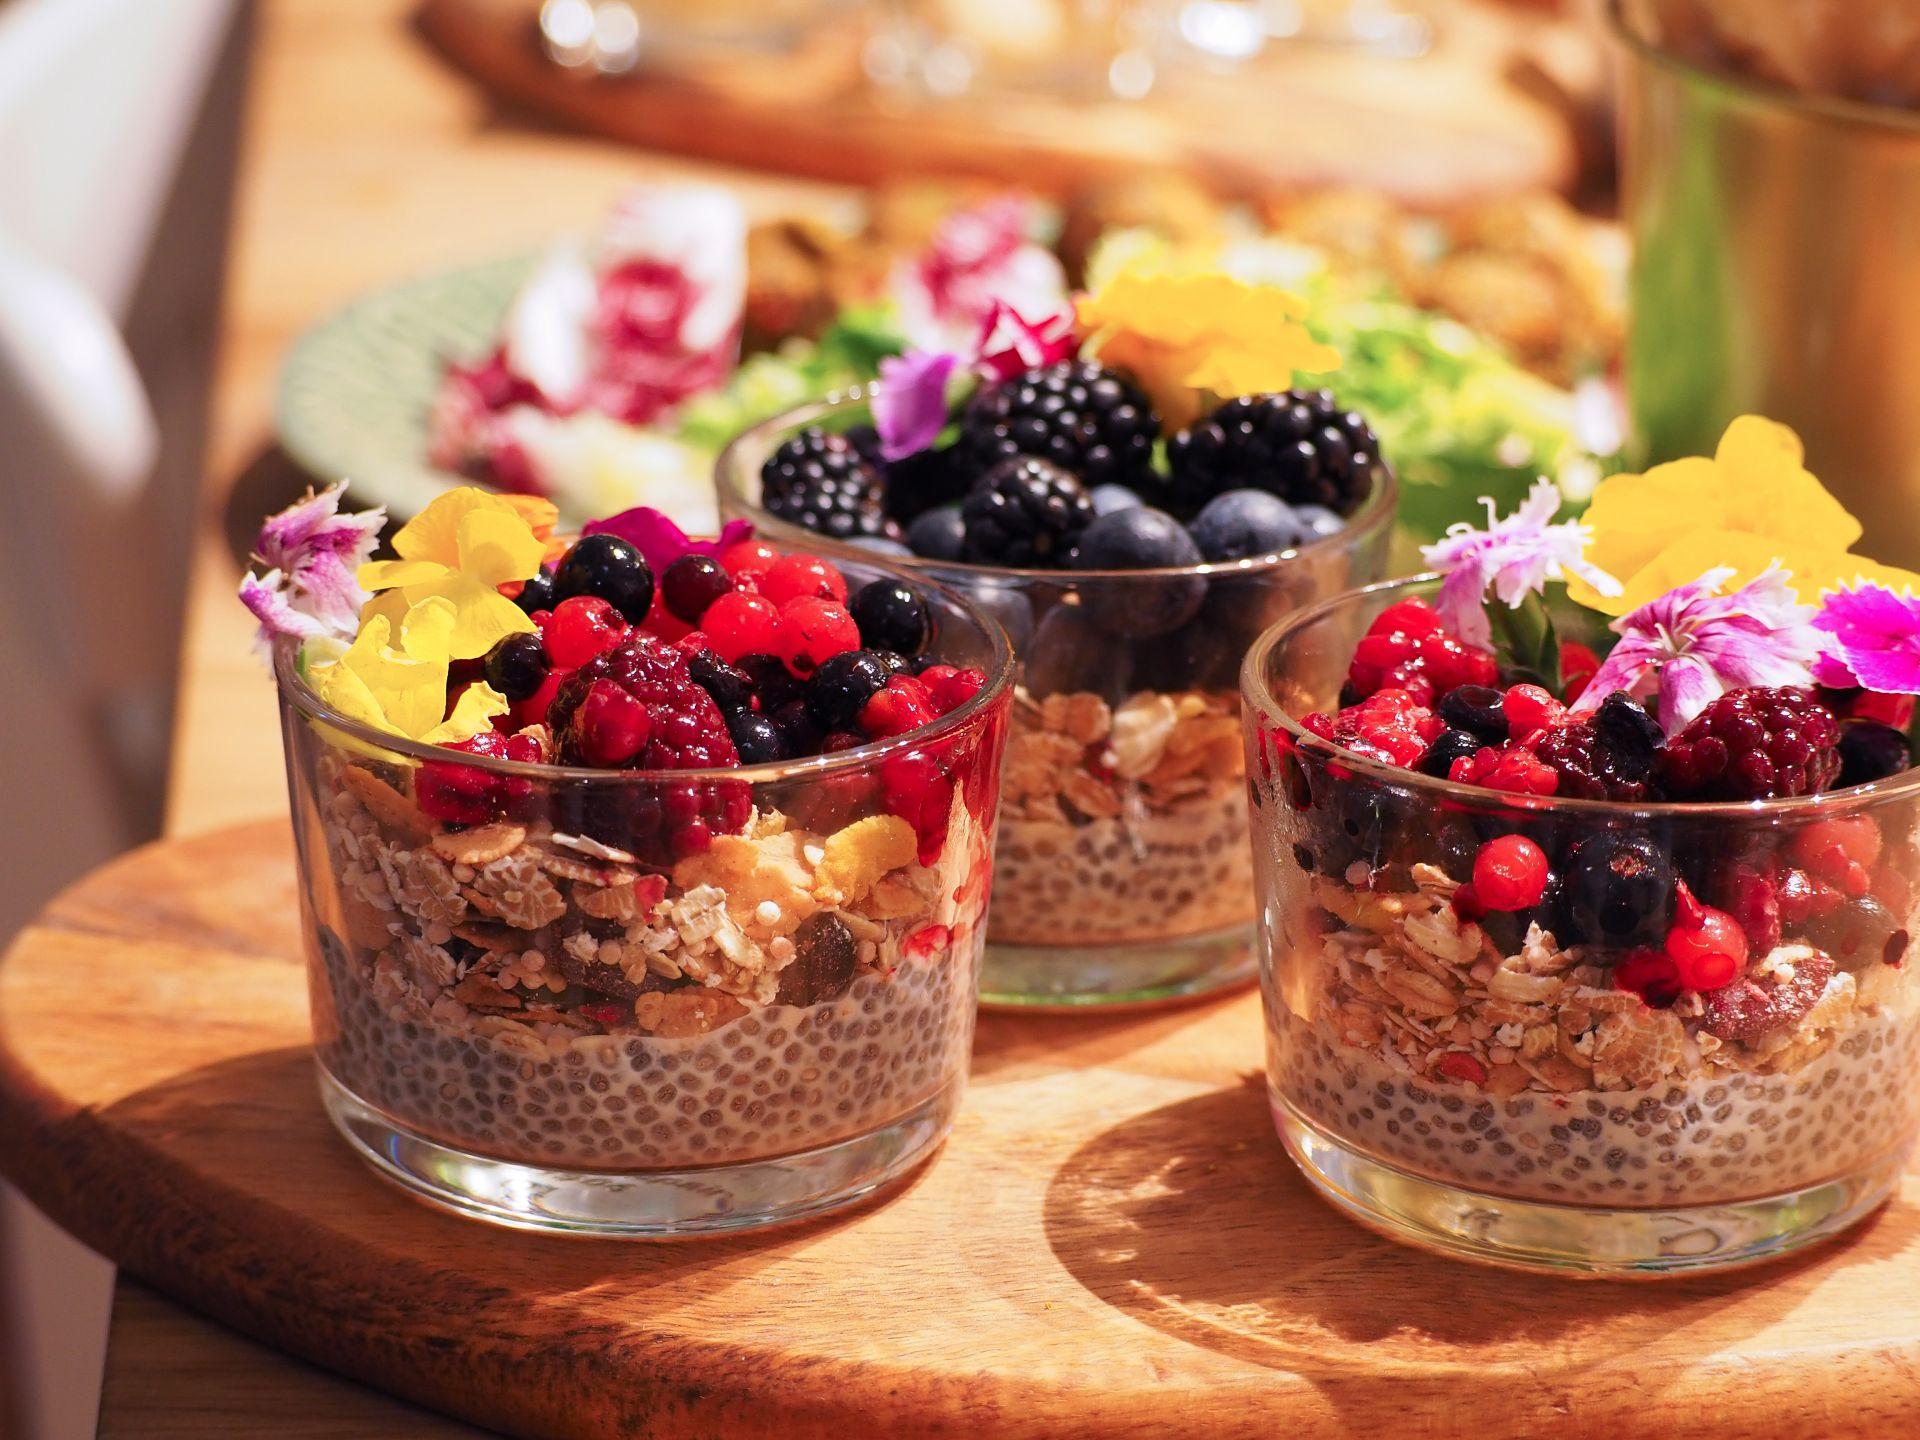 Receta Pudding de Chía sin alérgenos comunes